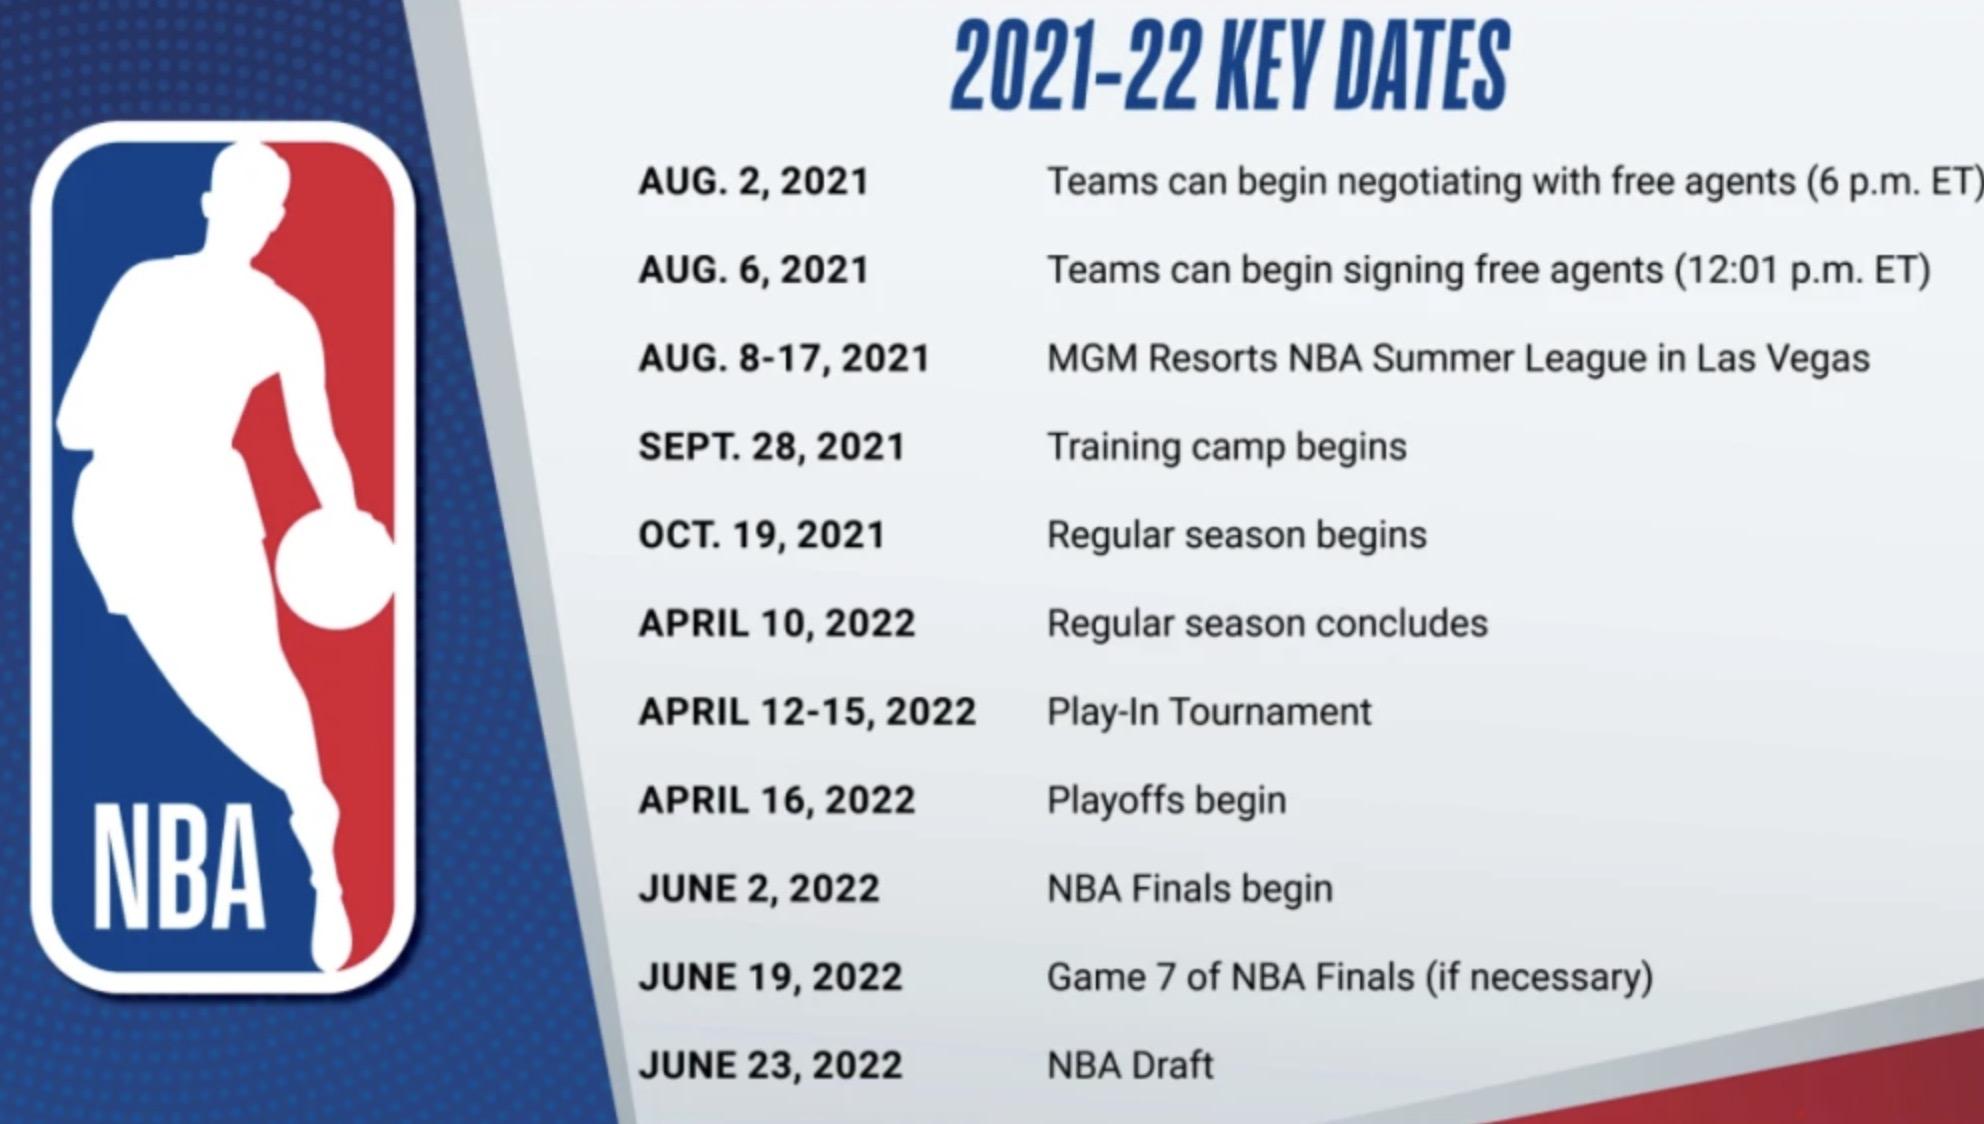 New season NBA schedule released